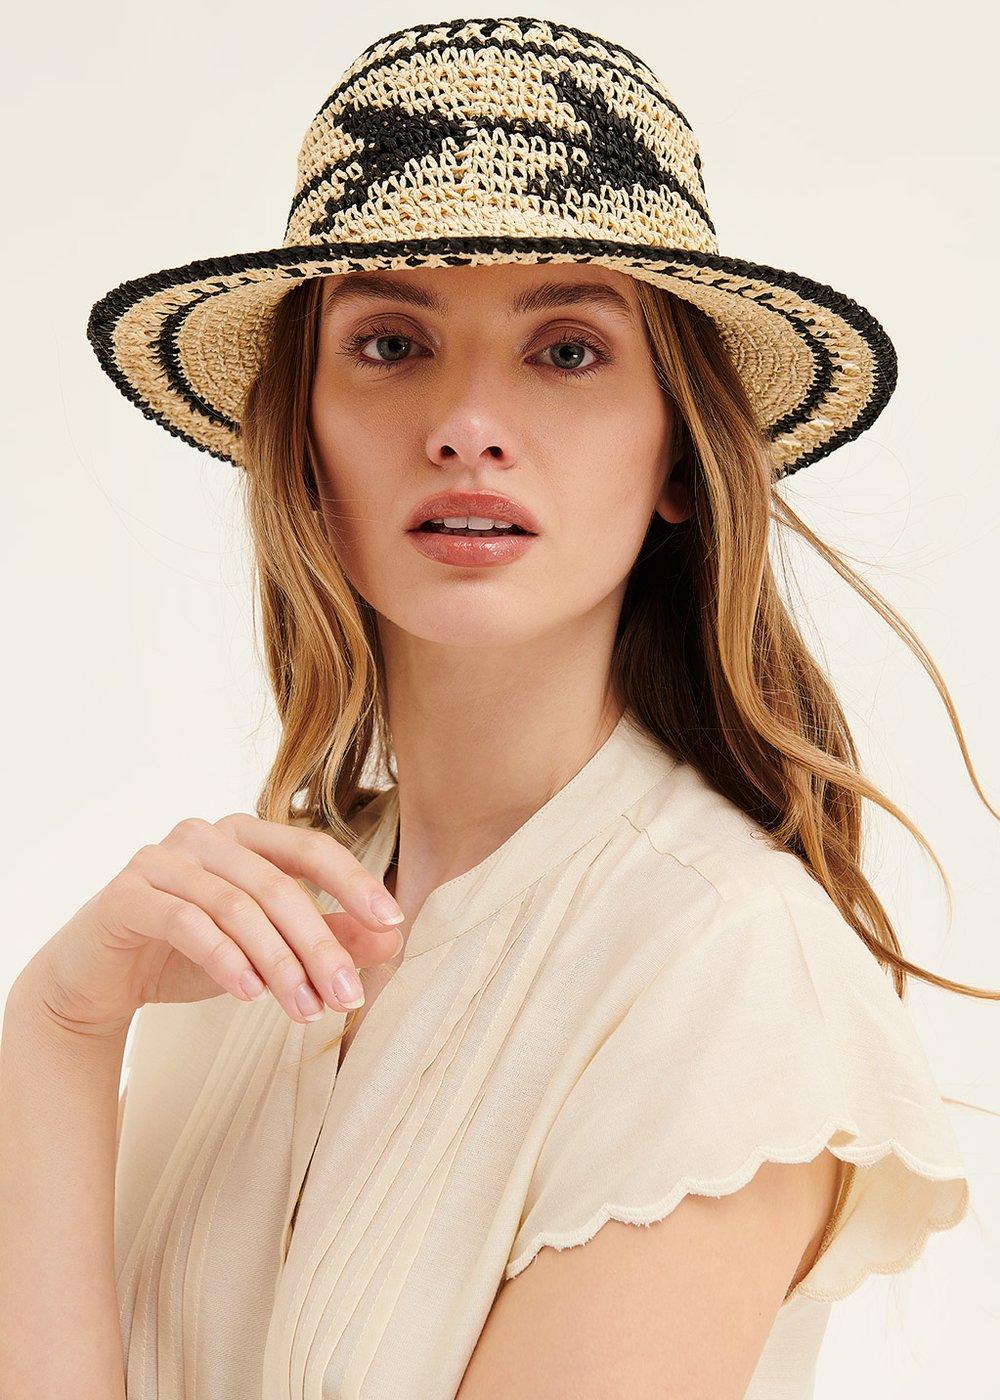 Cael beige and black hat - Beige / Black - Woman